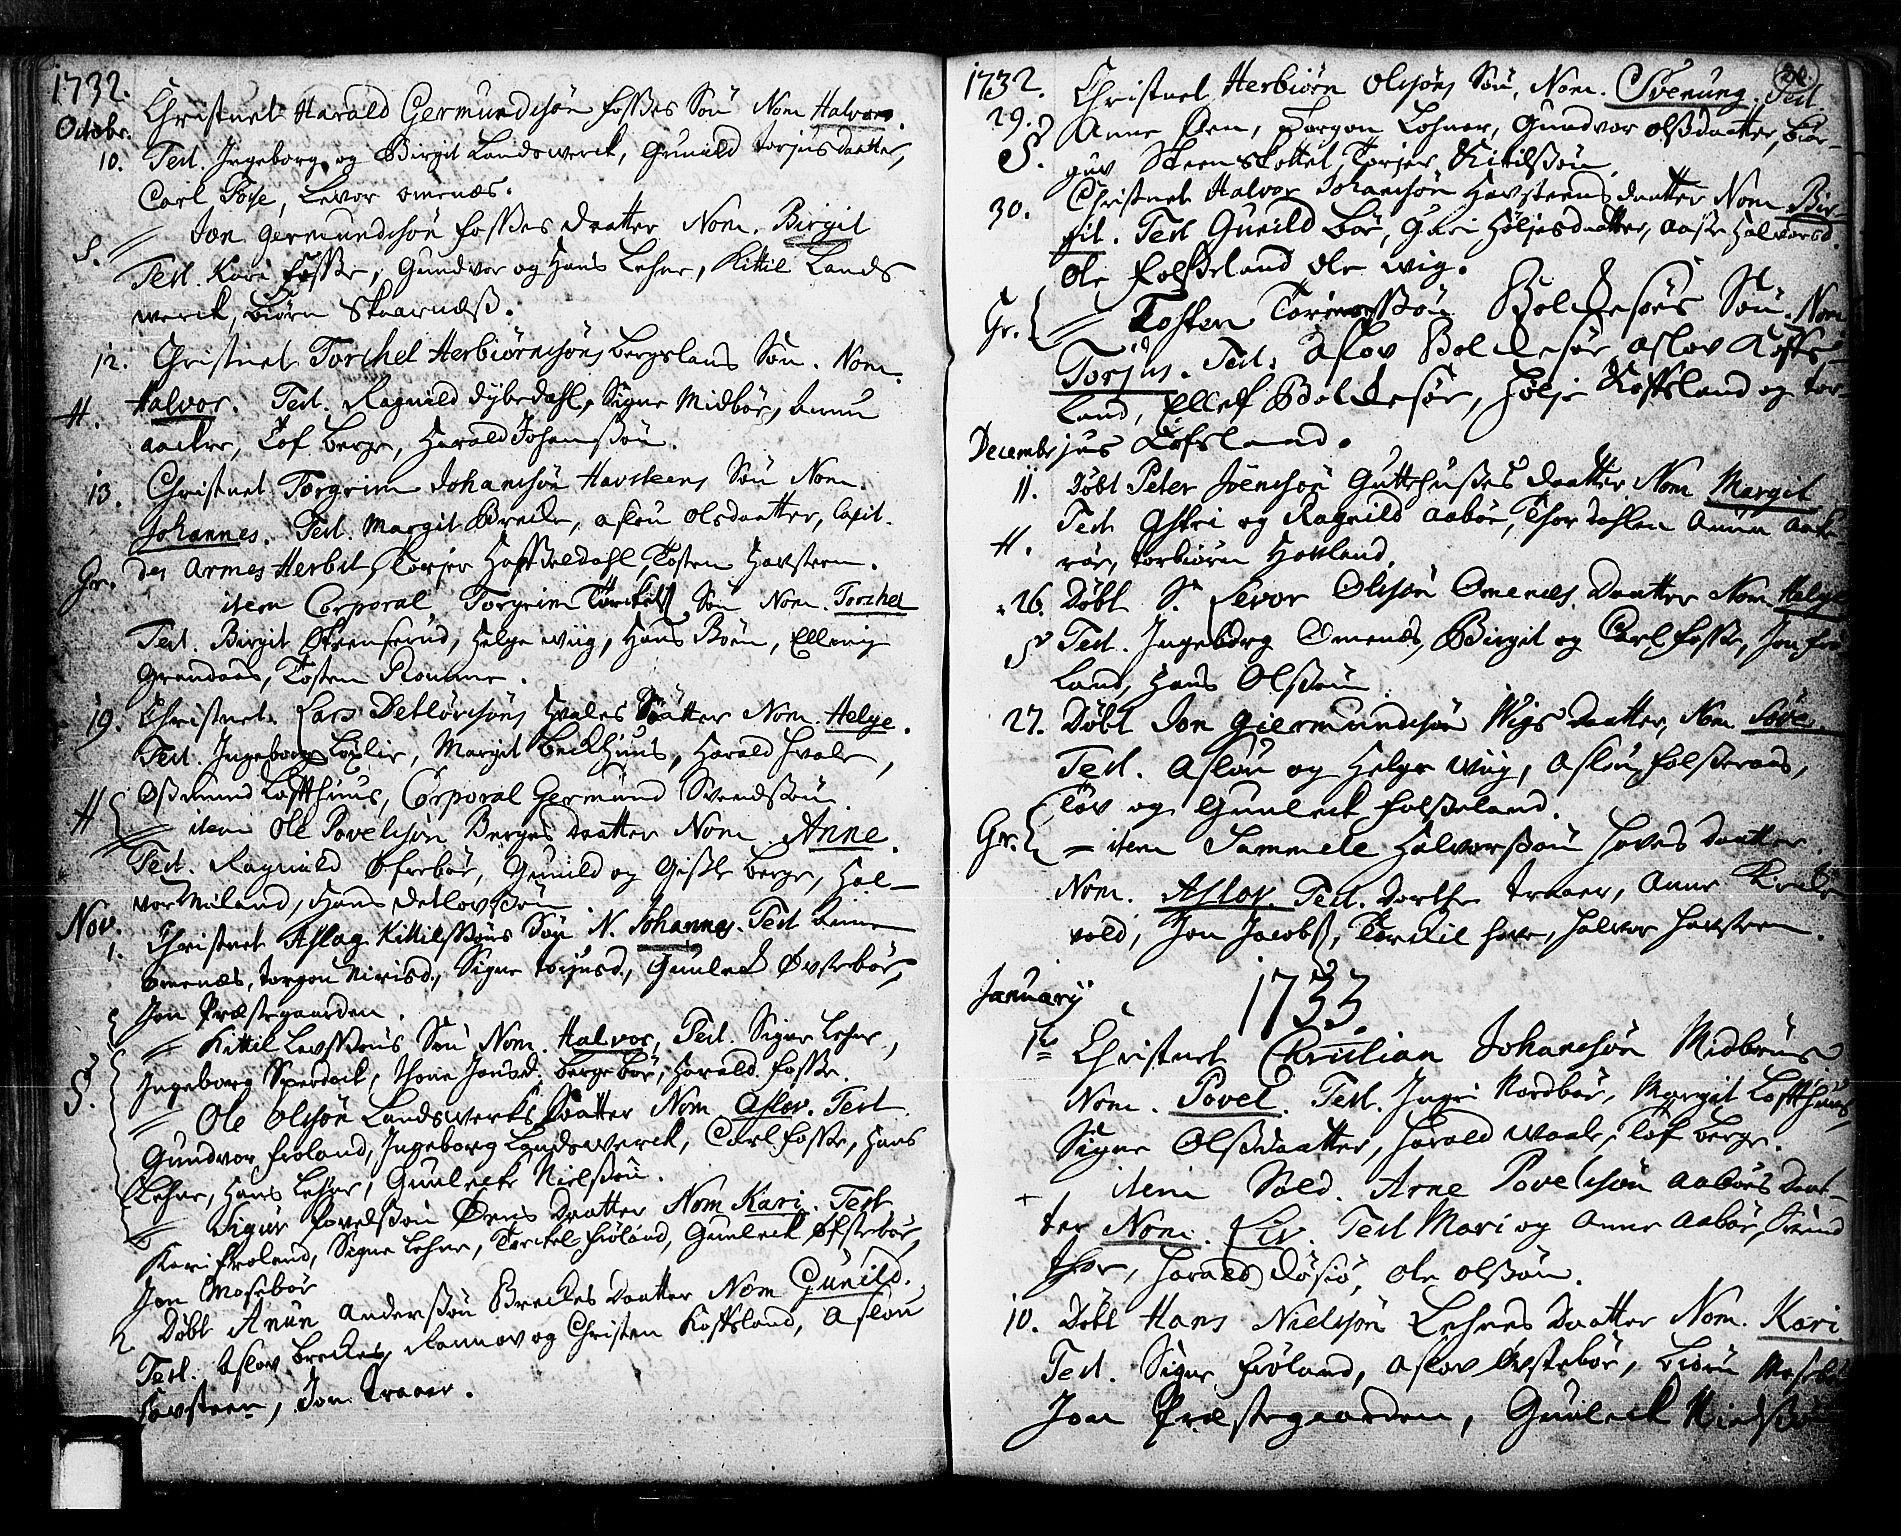 SAKO, Hjartdal kirkebøker, F/Fa/L0003: Ministerialbok nr. I 3, 1727-1775, s. 20